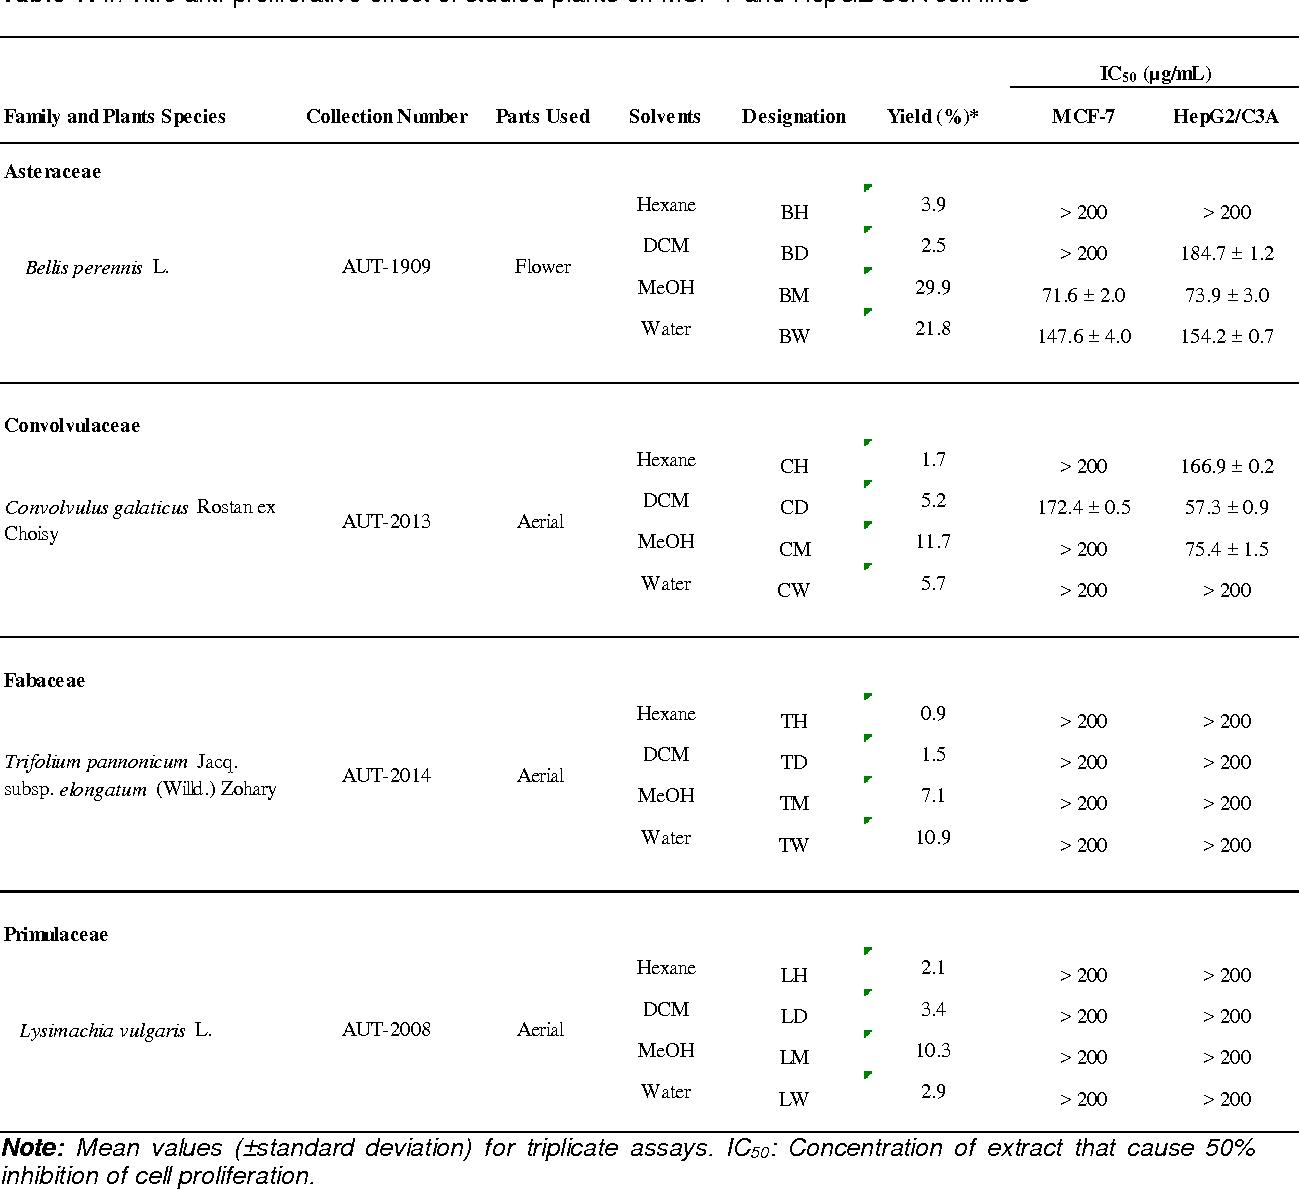 Antiproliferative Activity of Some Medicinal Plants on Human